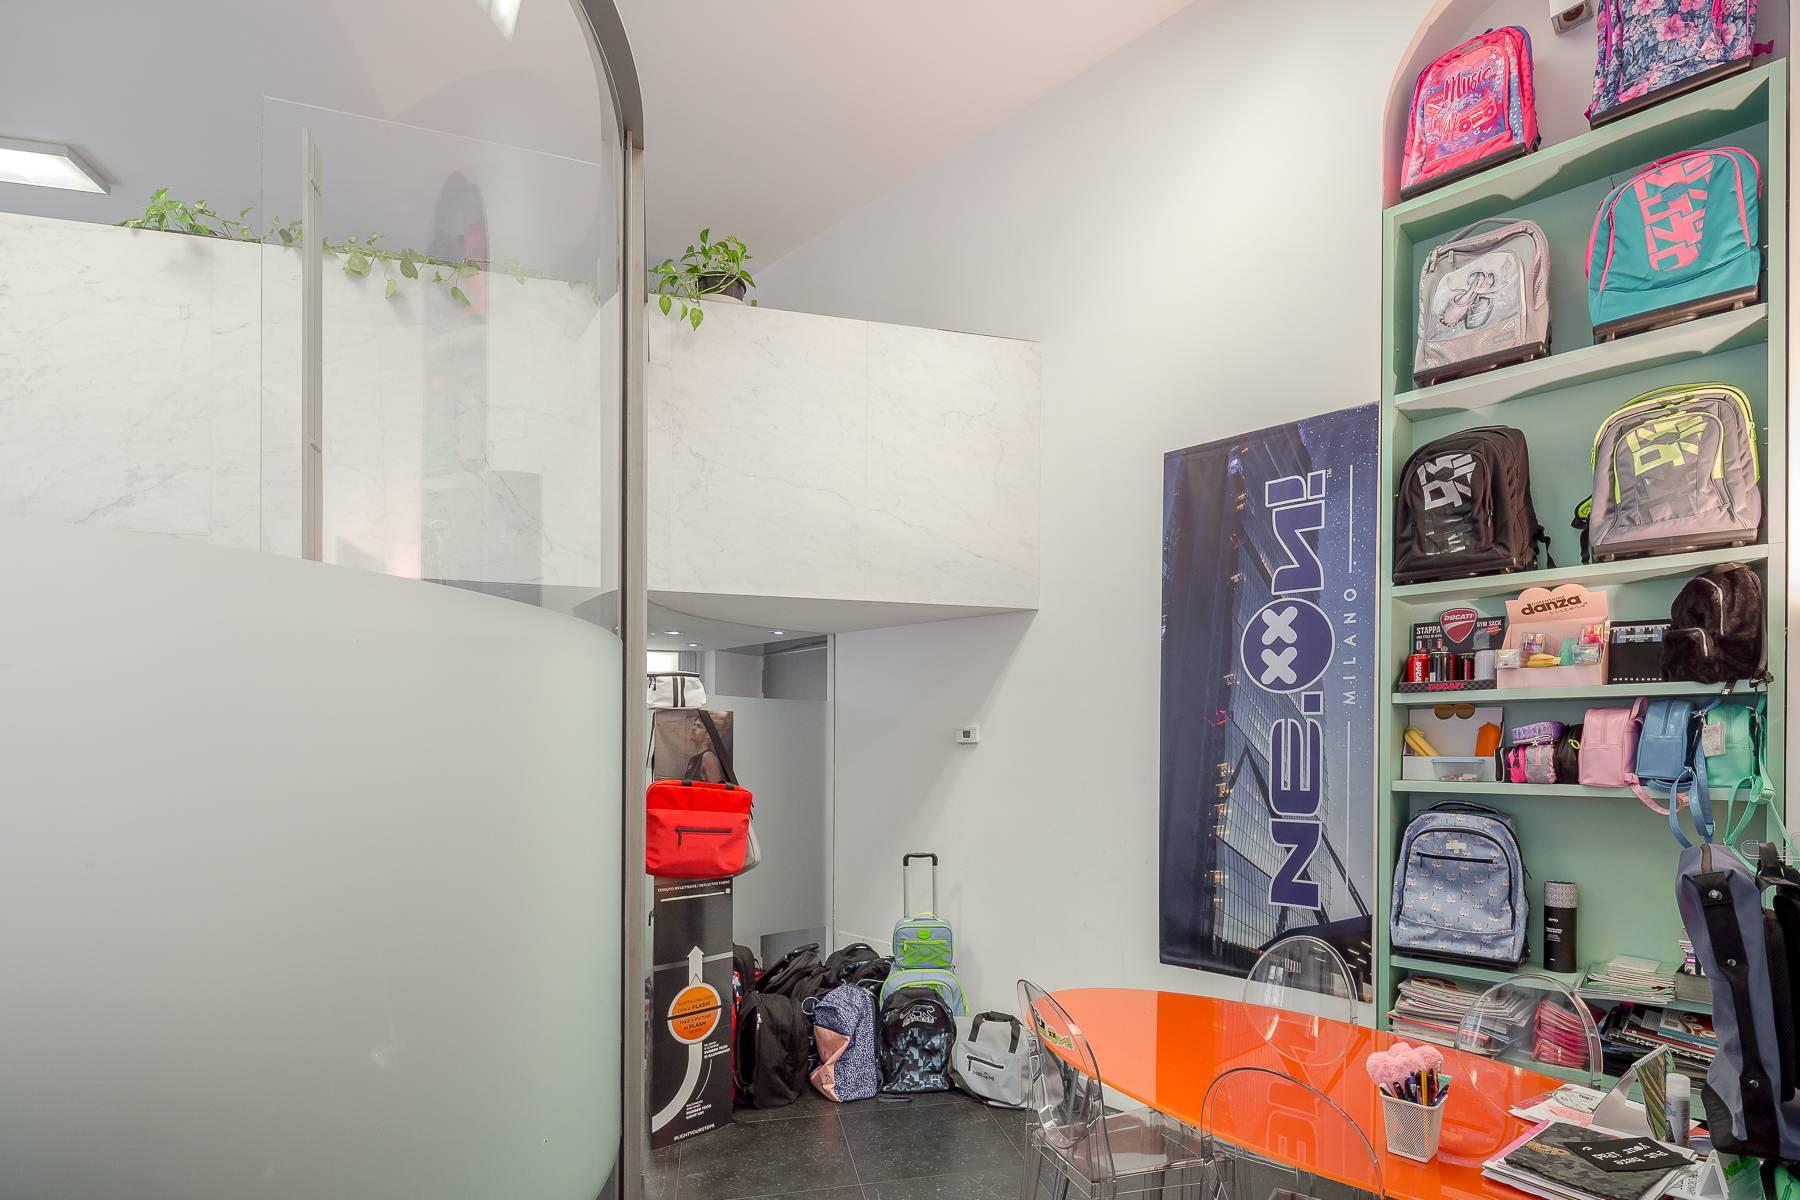 Open space office/residential property in Piazza Giovine Italia/Via Aurelio Saffi - 23